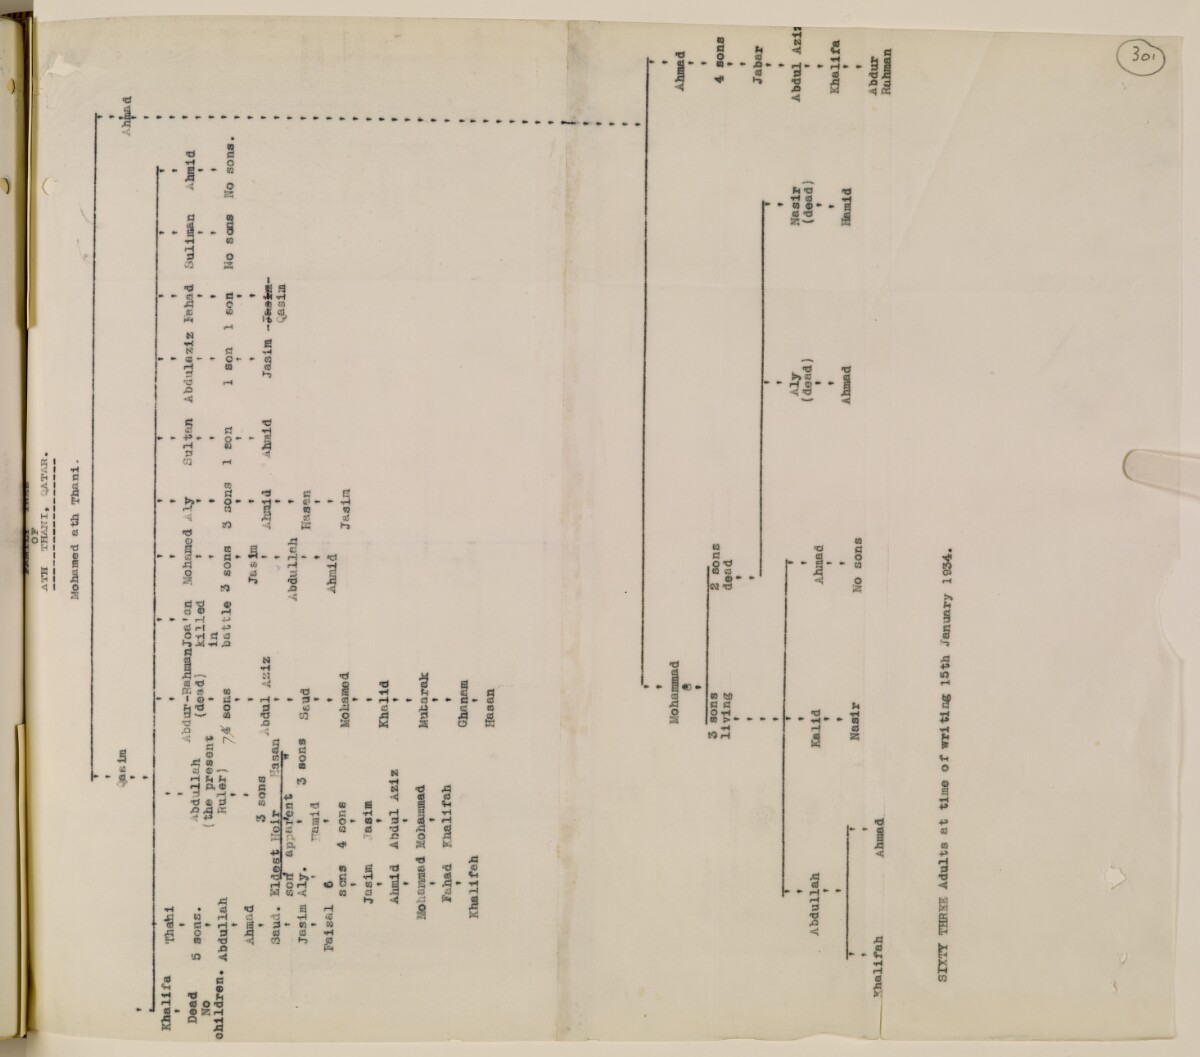 Coll 6/63 'SOUTH EASTERN ARABIA AND QATAR BOUNDARIES.' [301r] (608/756)